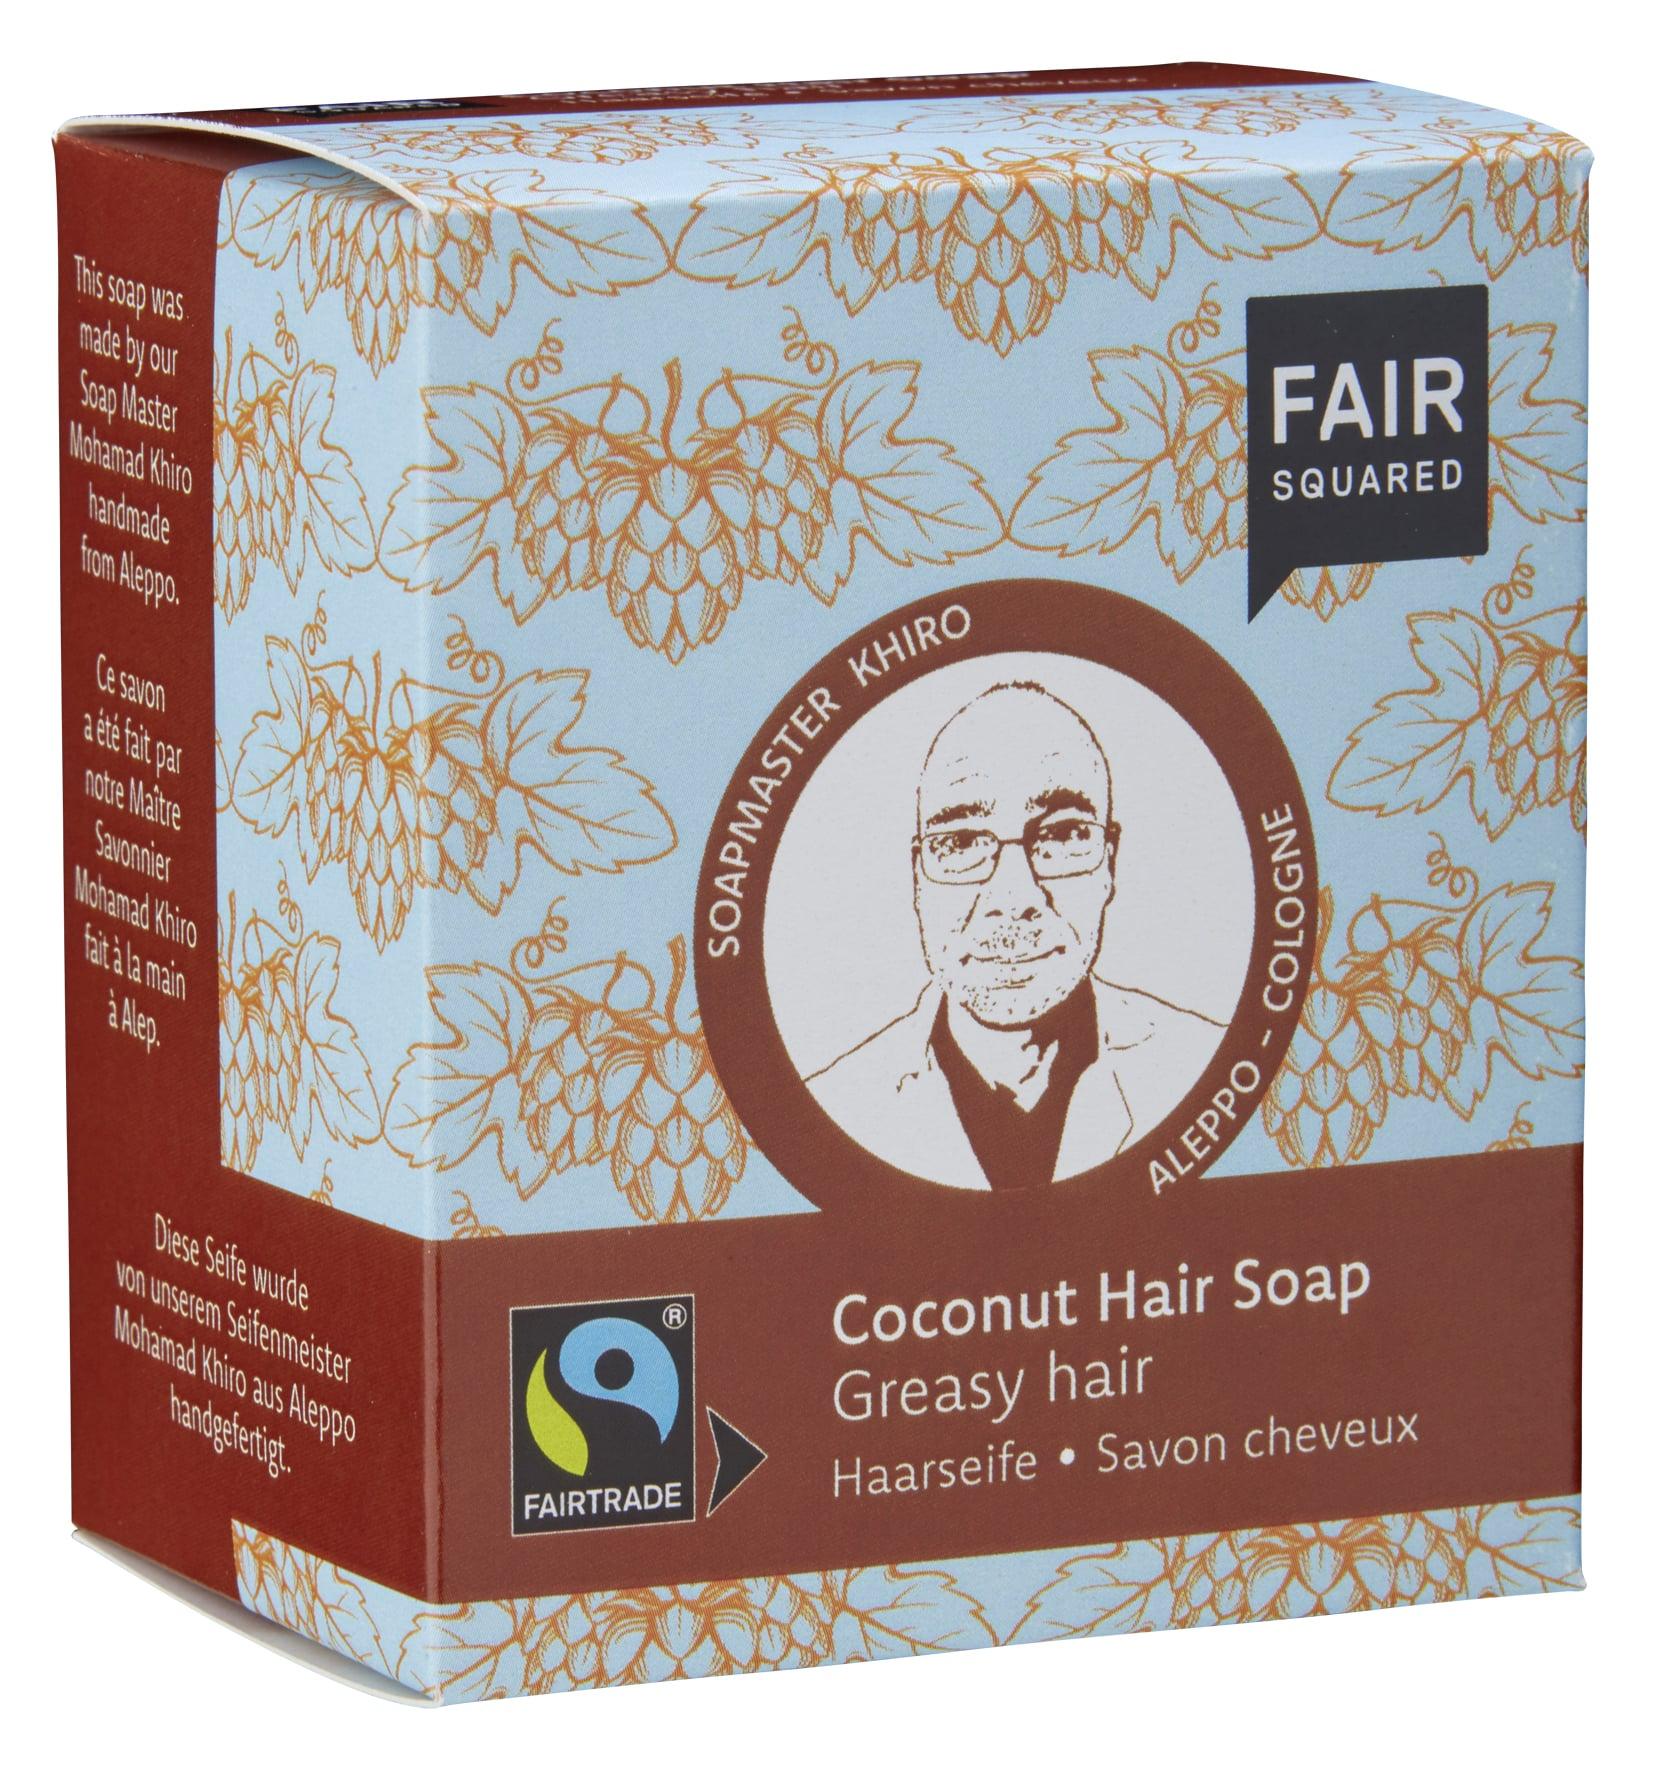 Coconut Hair Soap Greasy